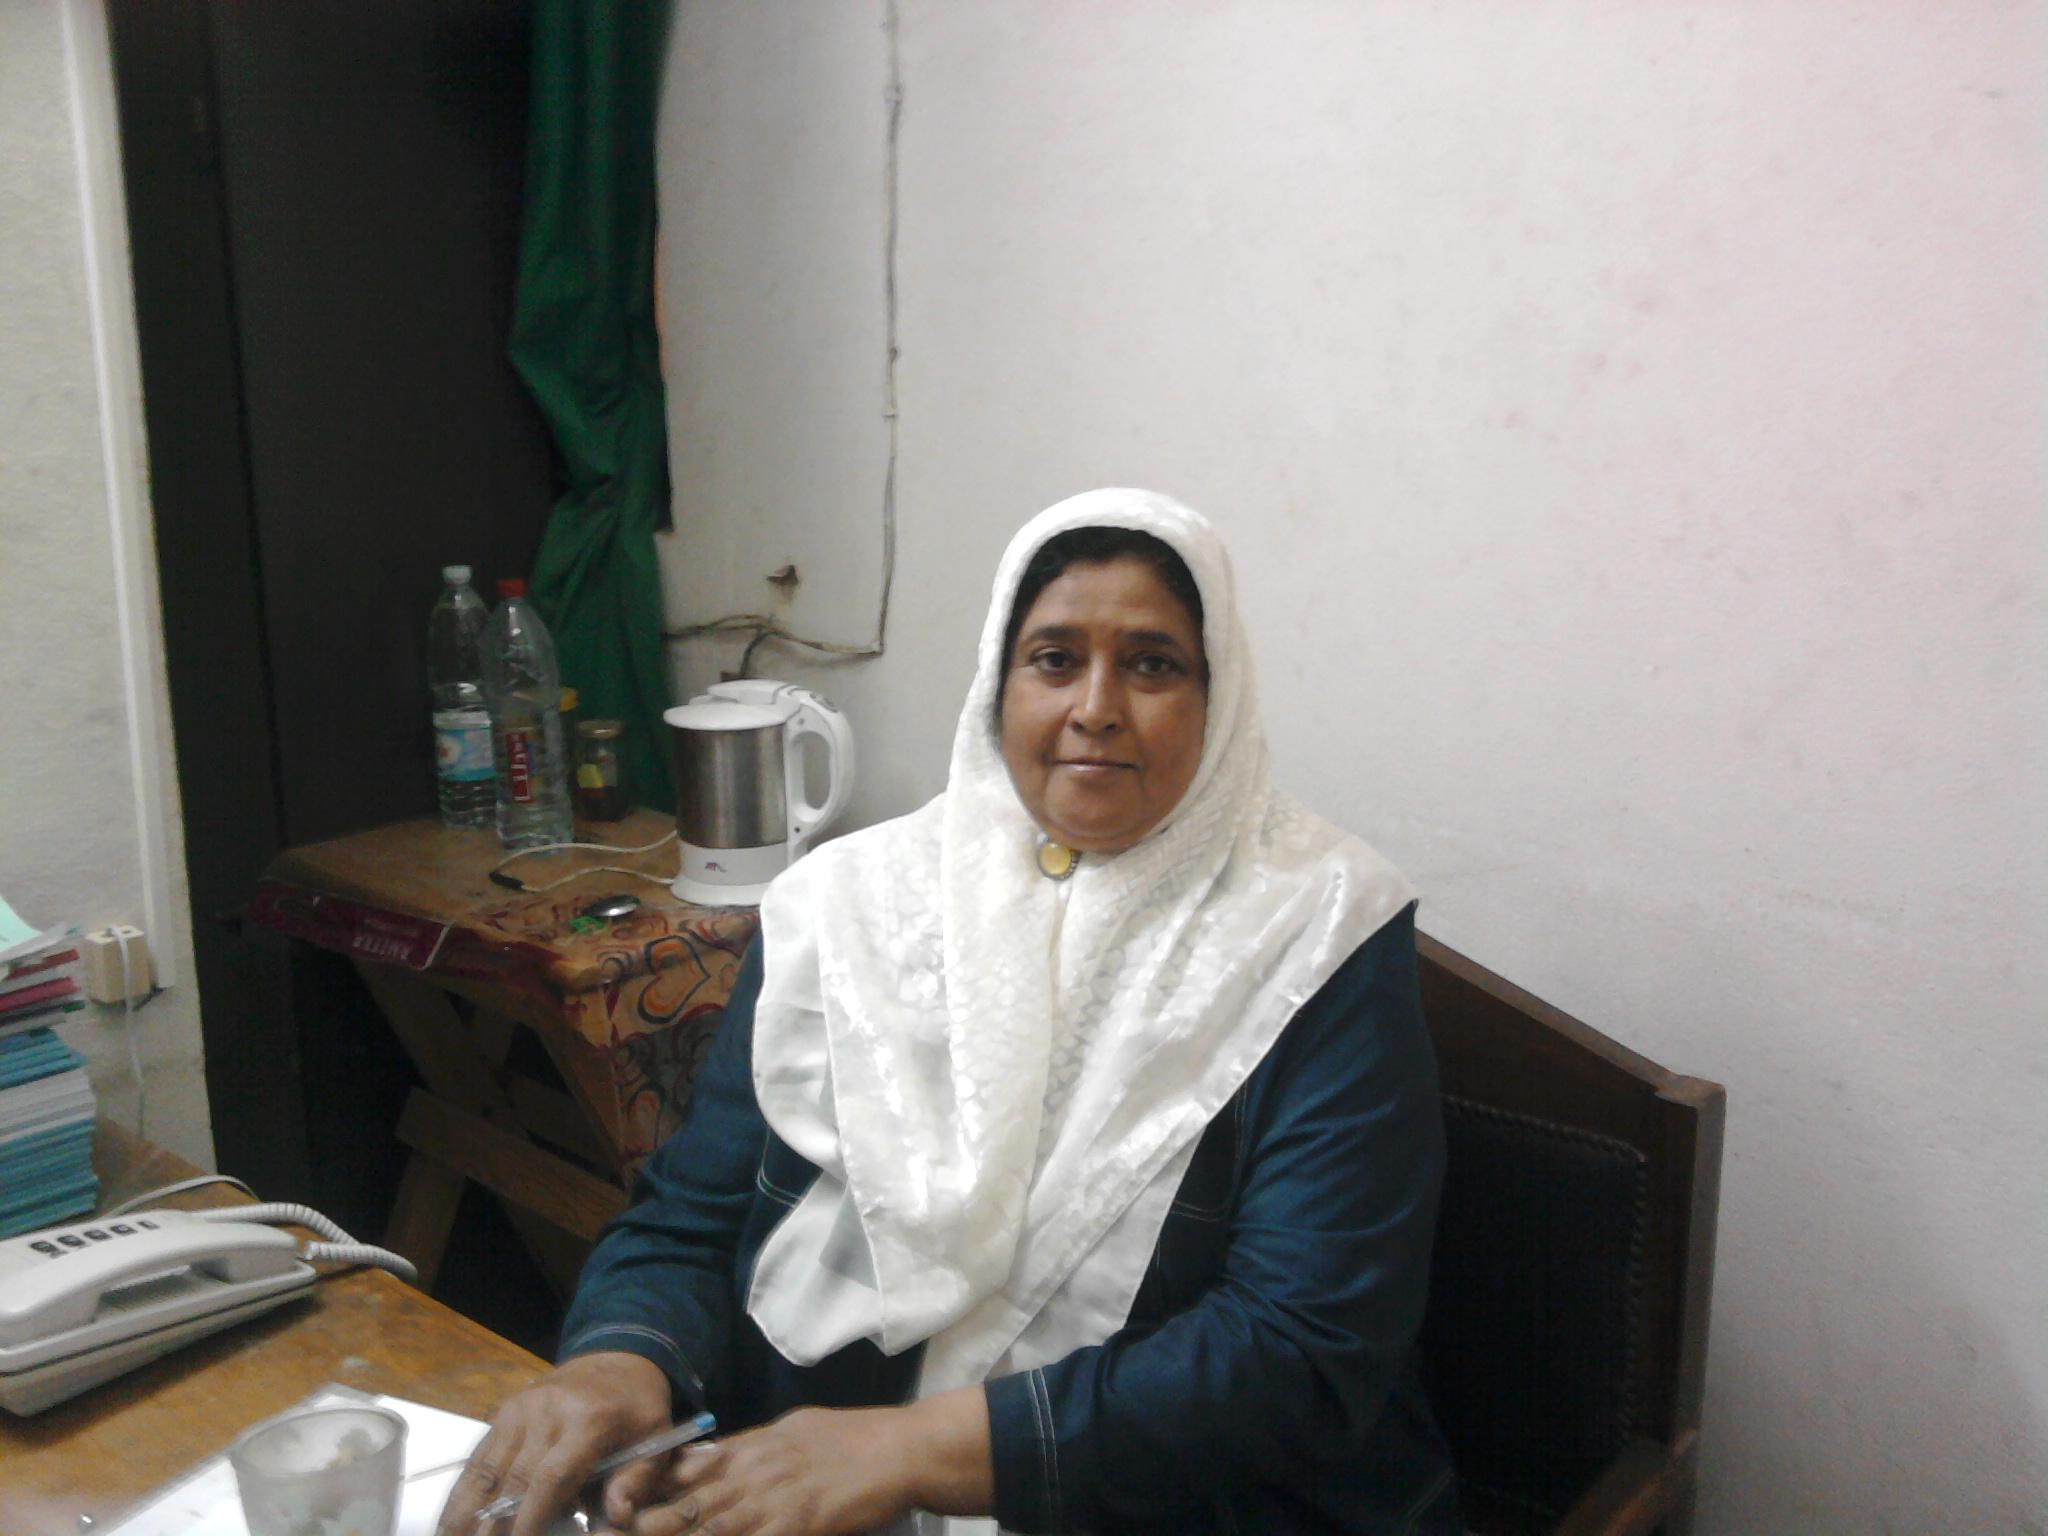 Zeinab Abdelbary